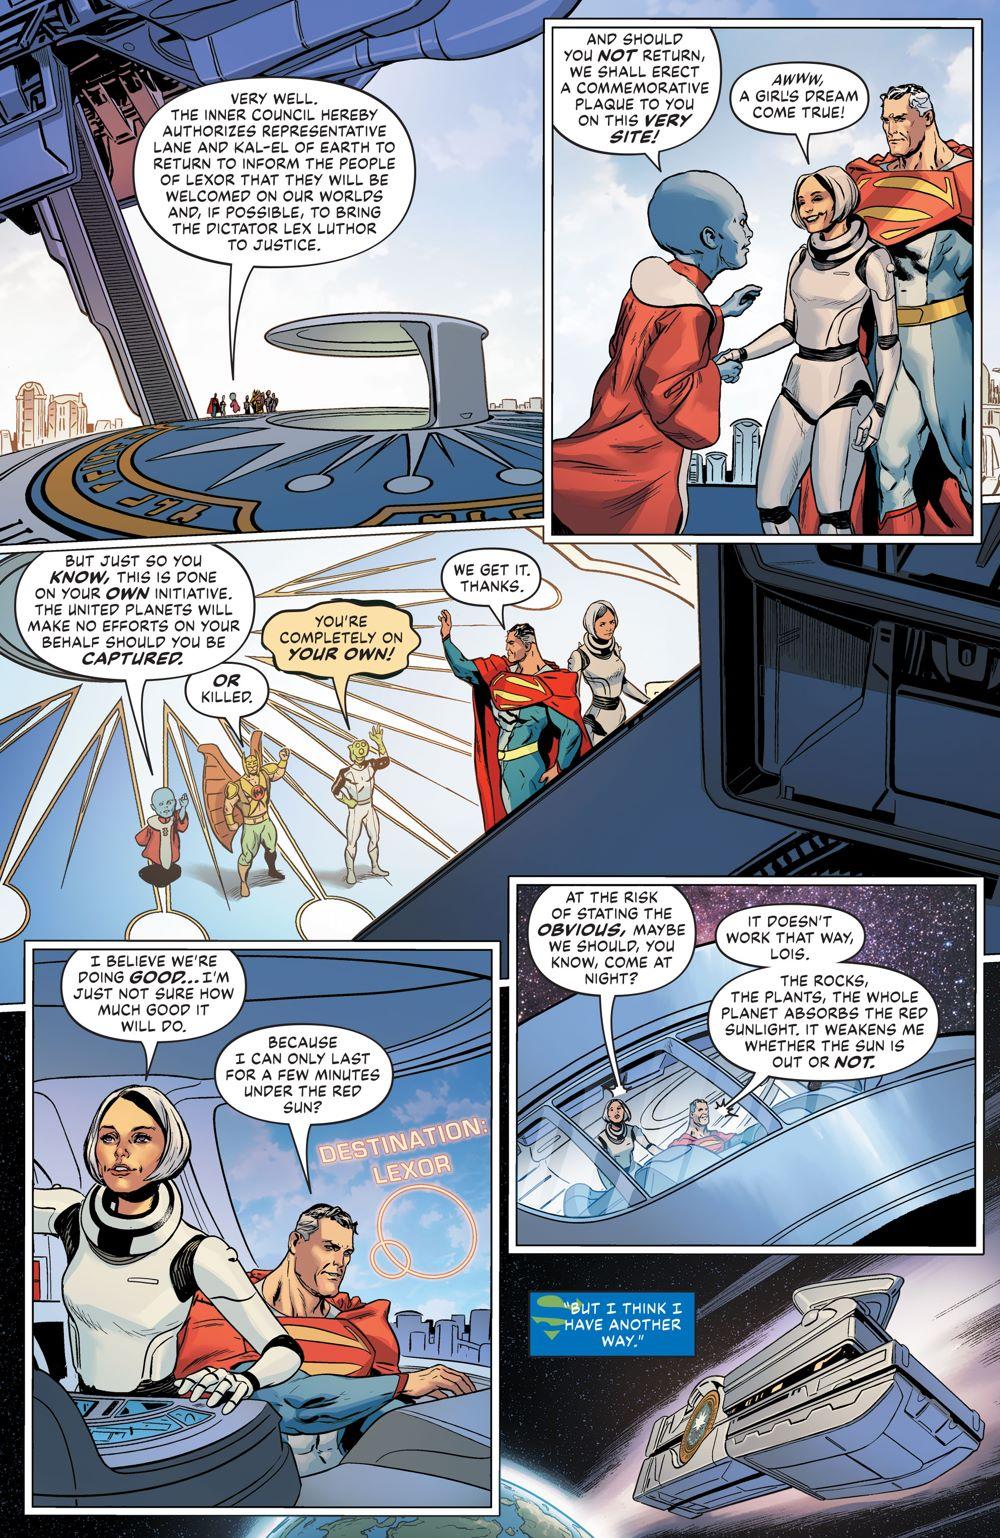 Future-State-Superman-vs-Imperious-Lex-3-4_605d4483e4e989.02638183 ComicList Previews: FUTURE STATE SUPERMAN VS IMPERIOUS LEX #3 (OF 3)